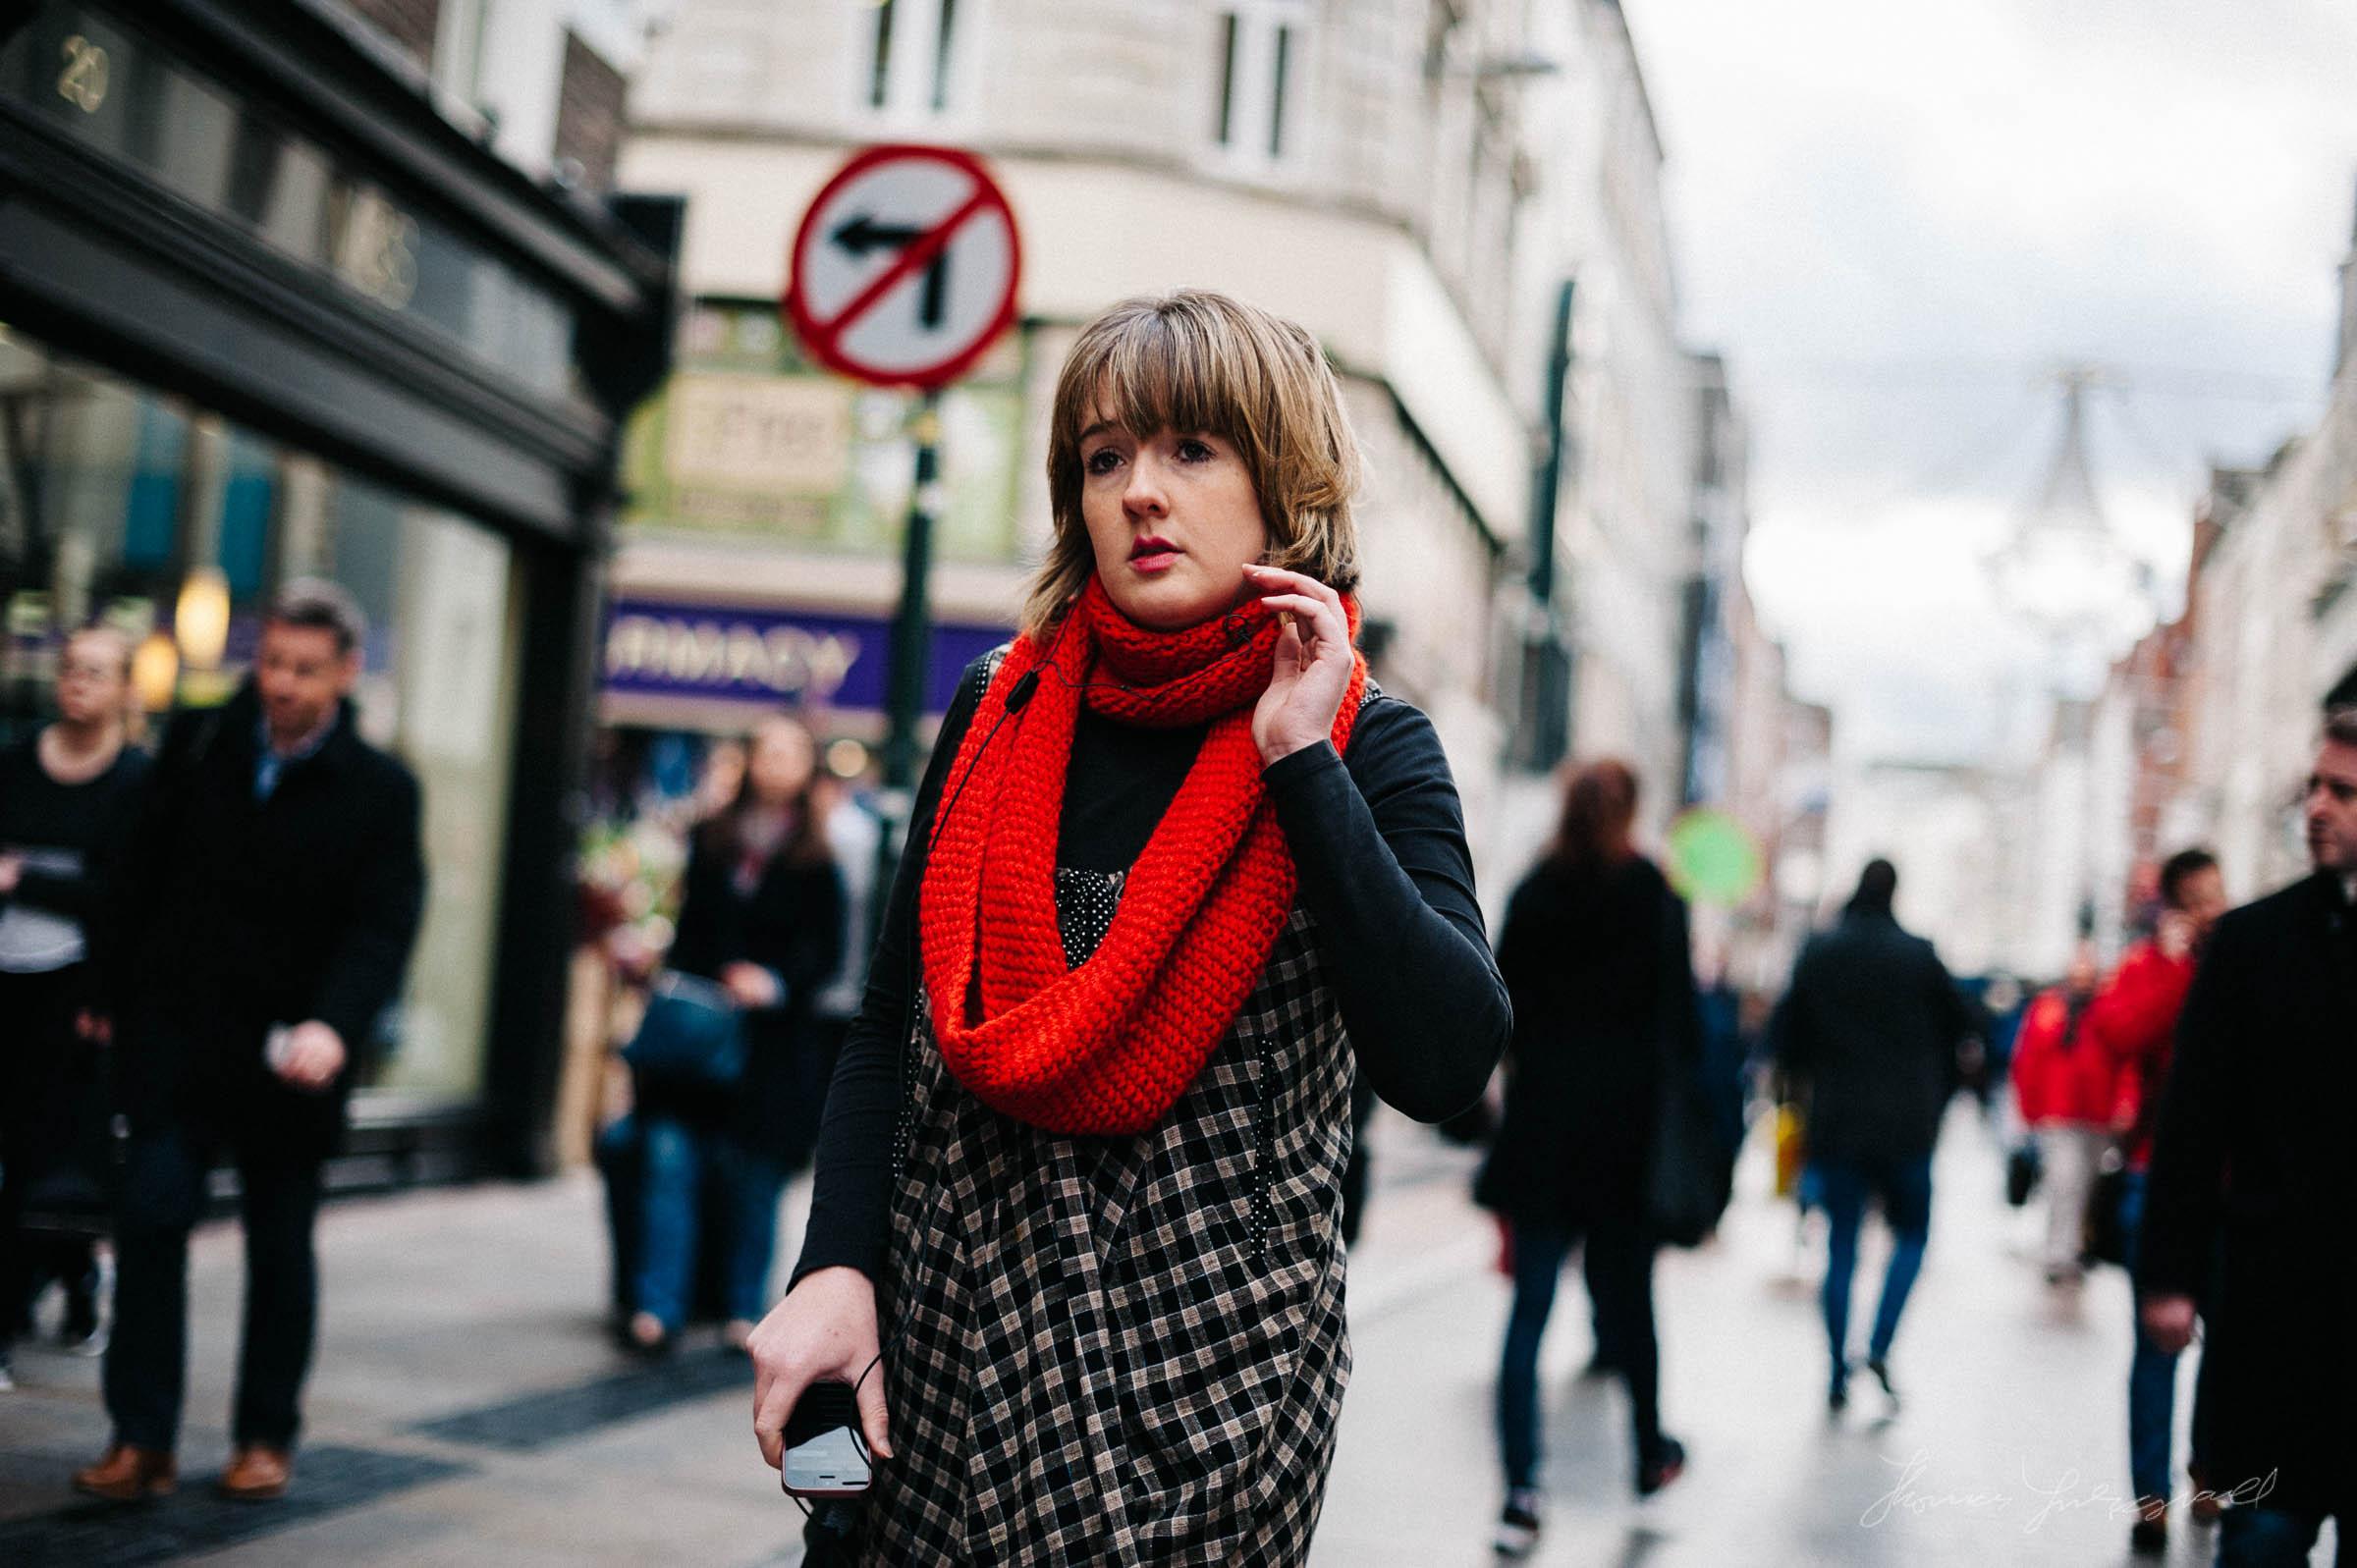 Street-photo-diary-eleven-02.jpg